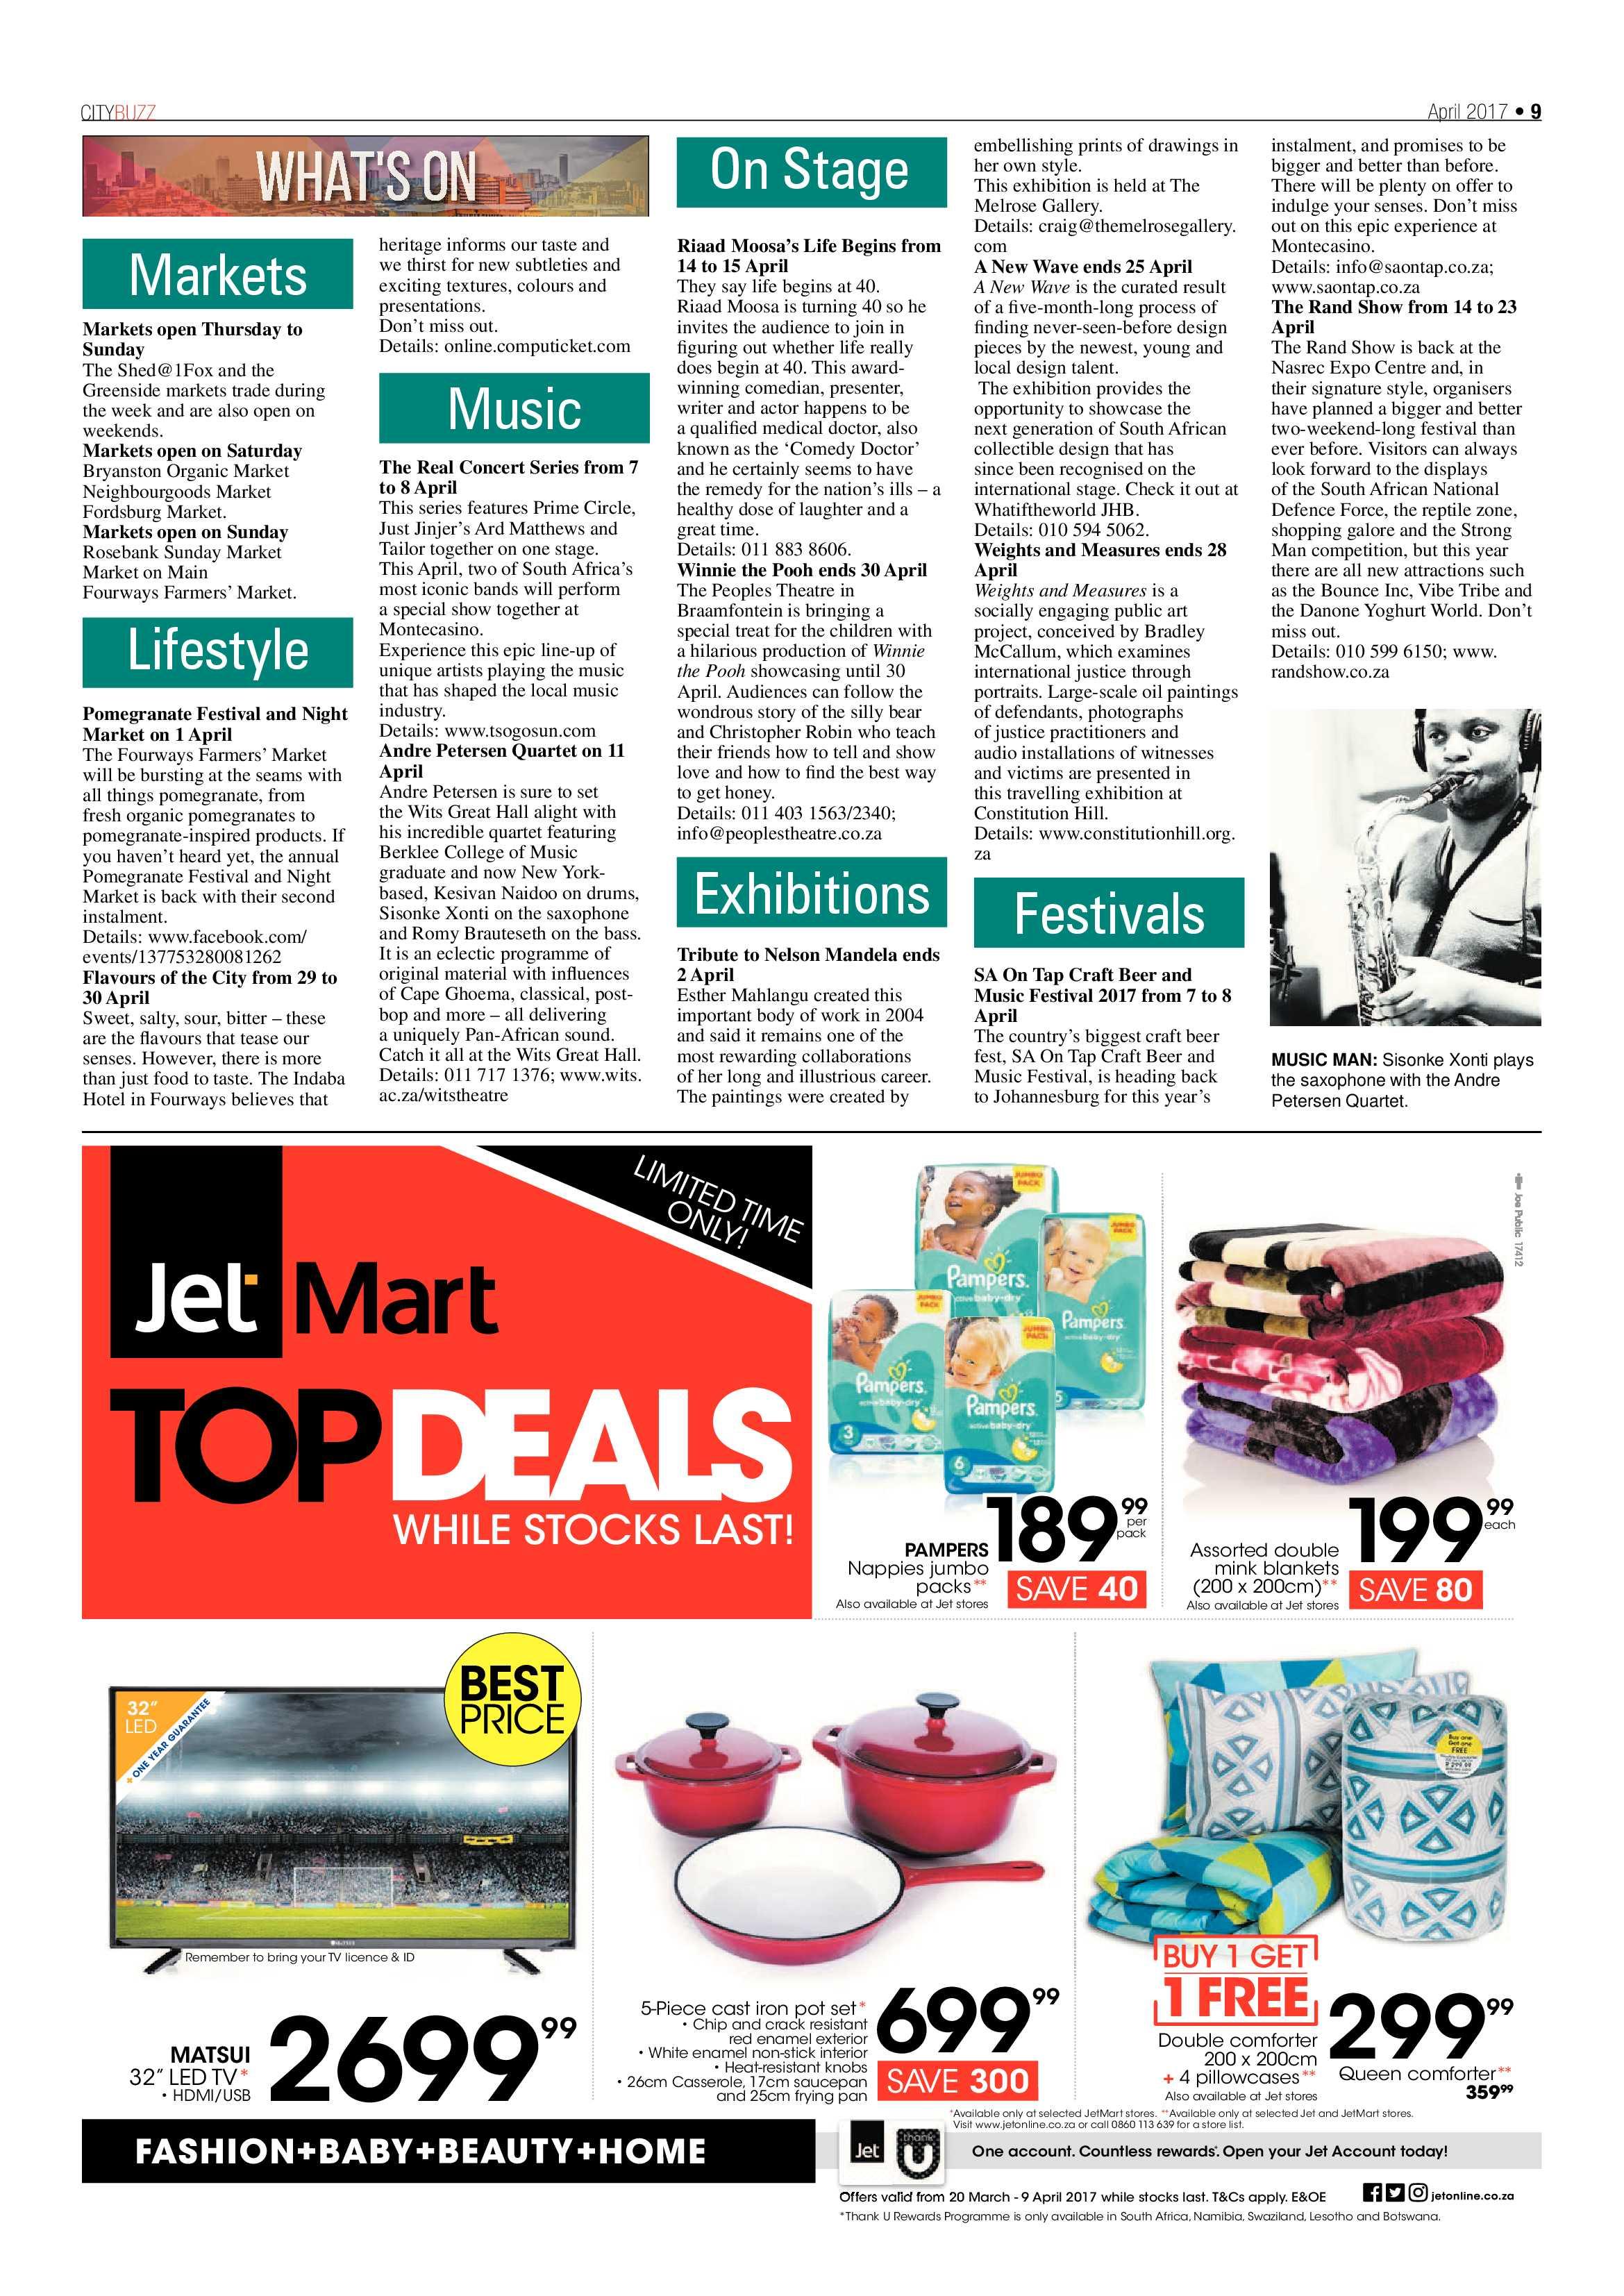 city-buzz-april-2017-epapers-page-9